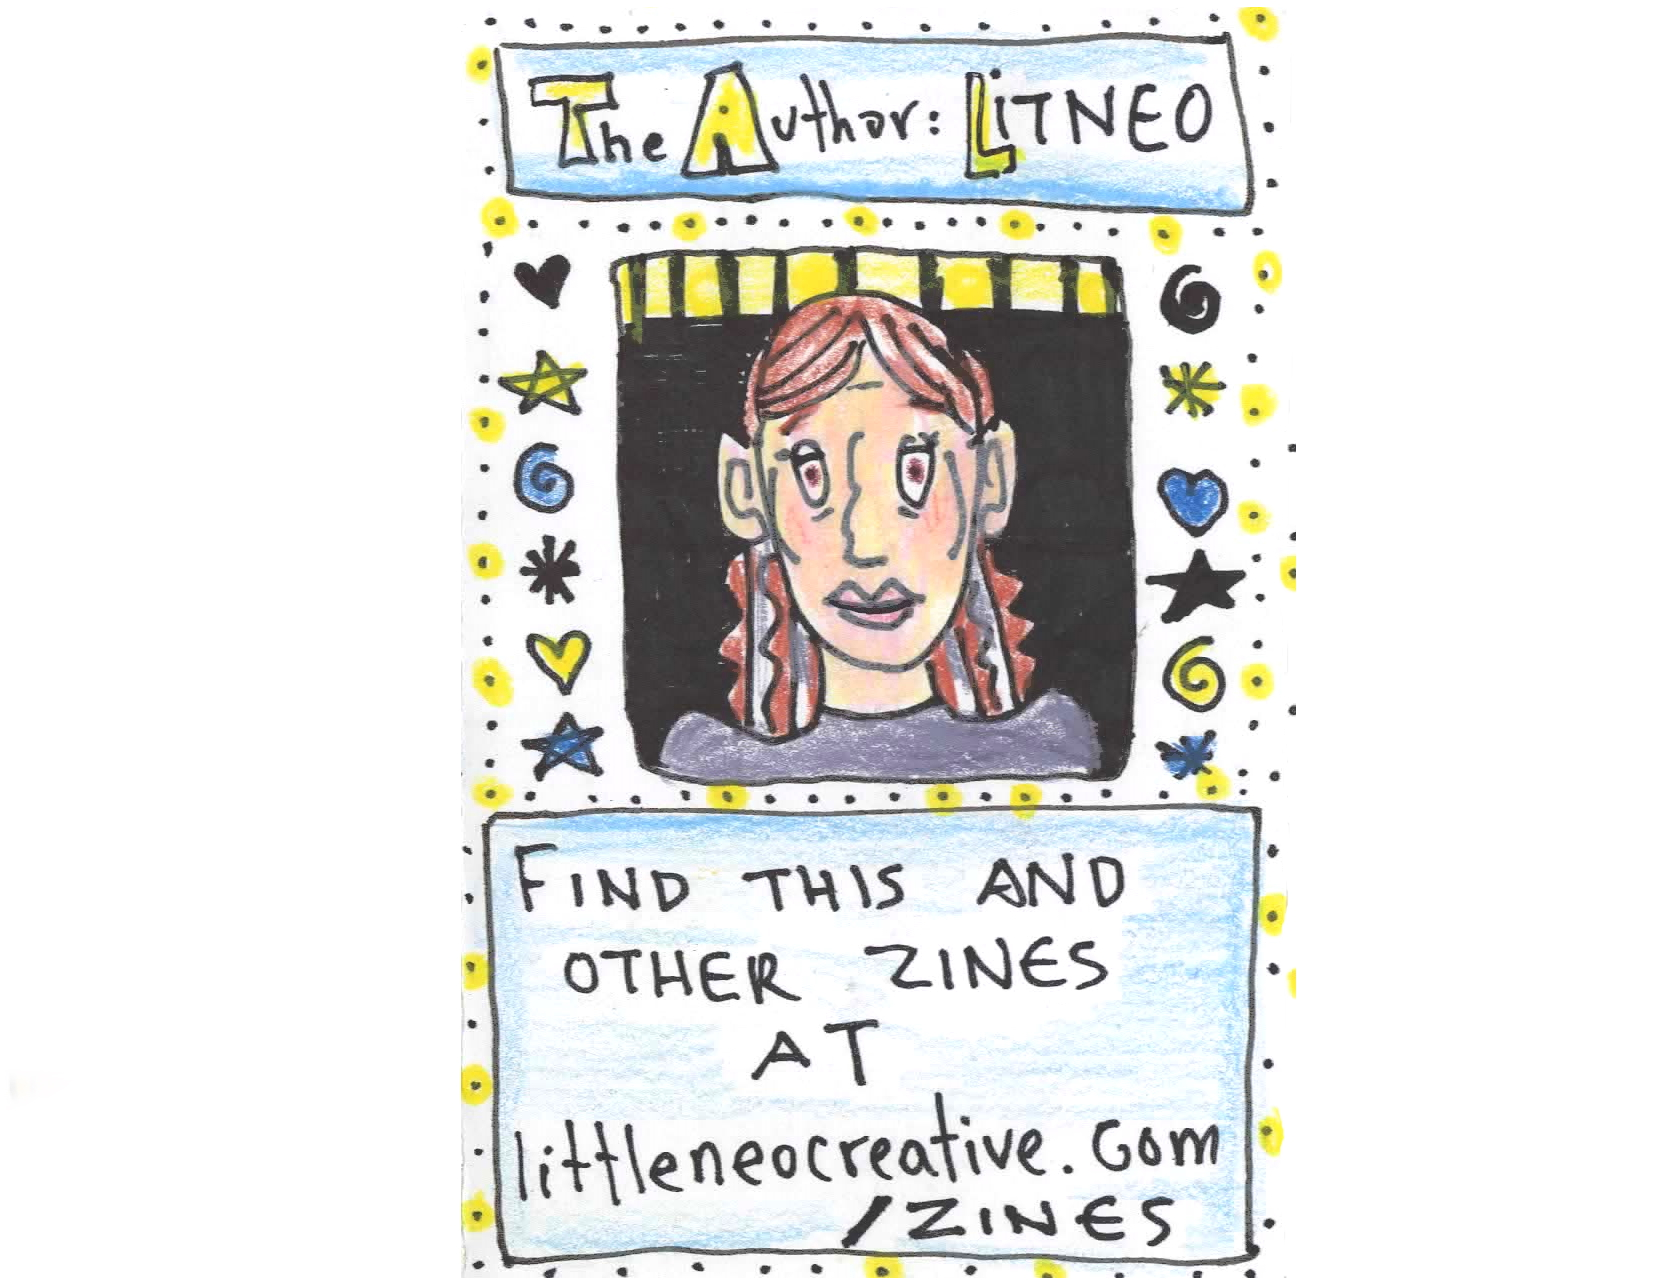 Nicole Little LitNEO littleneocreative littleoutrageous ABOUT page